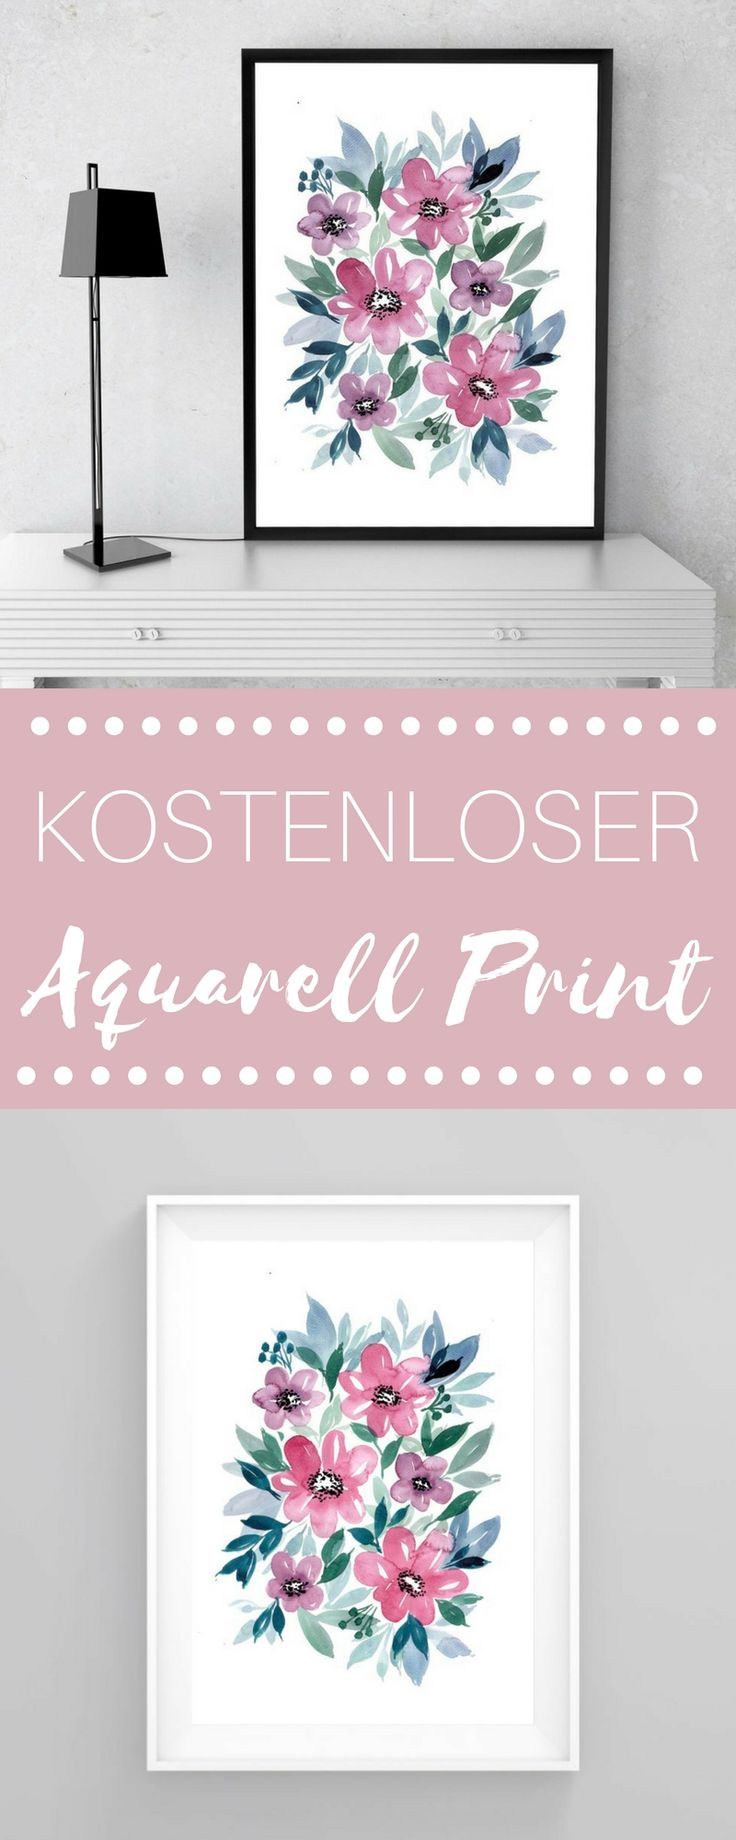 Pinsel für Aquarell